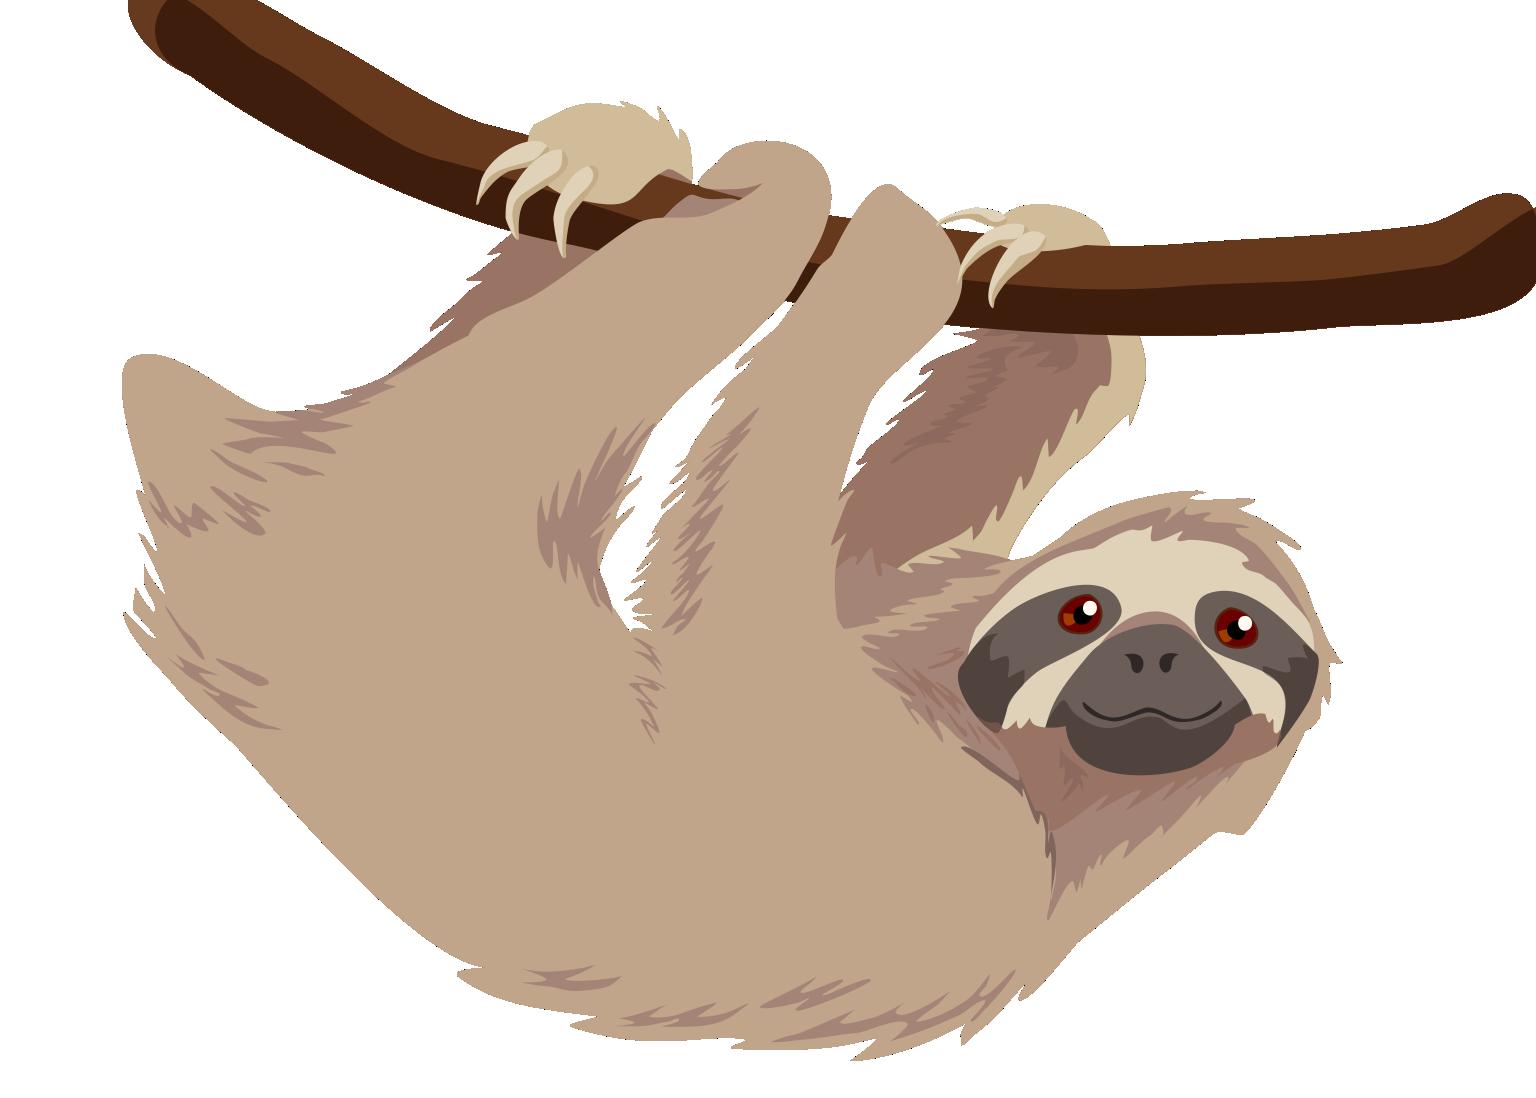 Three toed sloth | Veronica Guzzardi